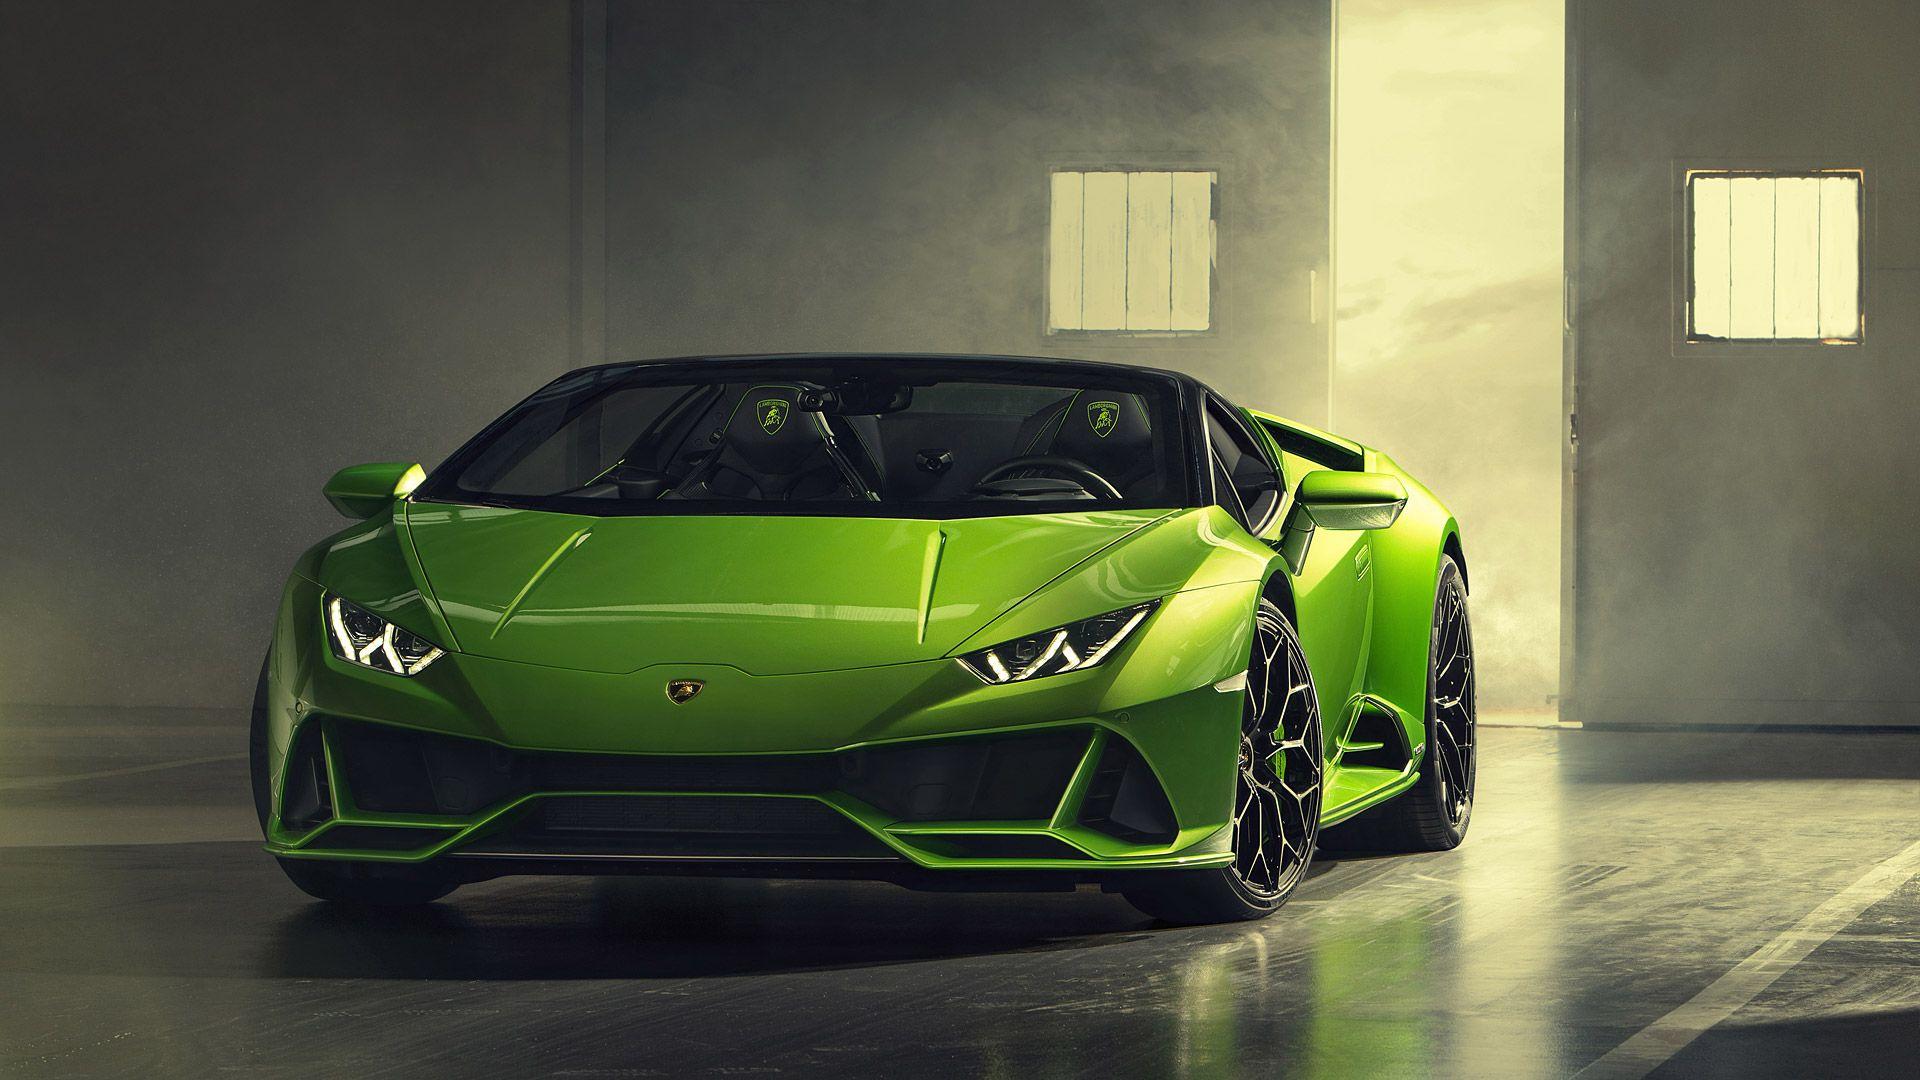 2019 Lamborghini Huracan Evo Spyder Lamborghini Huracan Lamborghini Super Cars